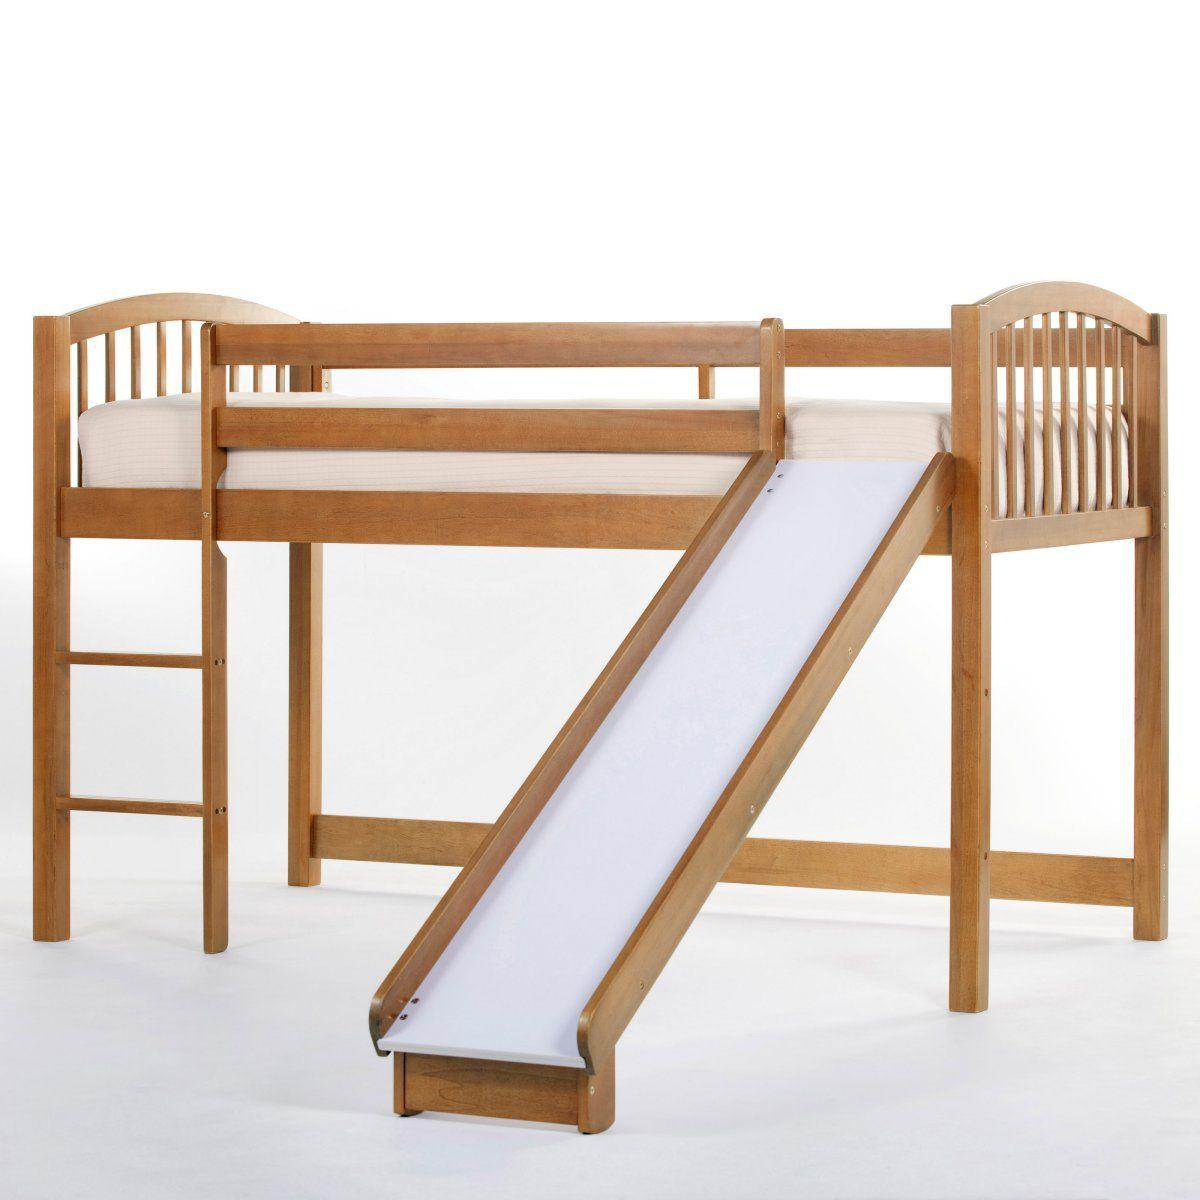 Slide for loft bed  Schoolhouse Junior Loft with Slide  Pecan  Loft Beds at Simply